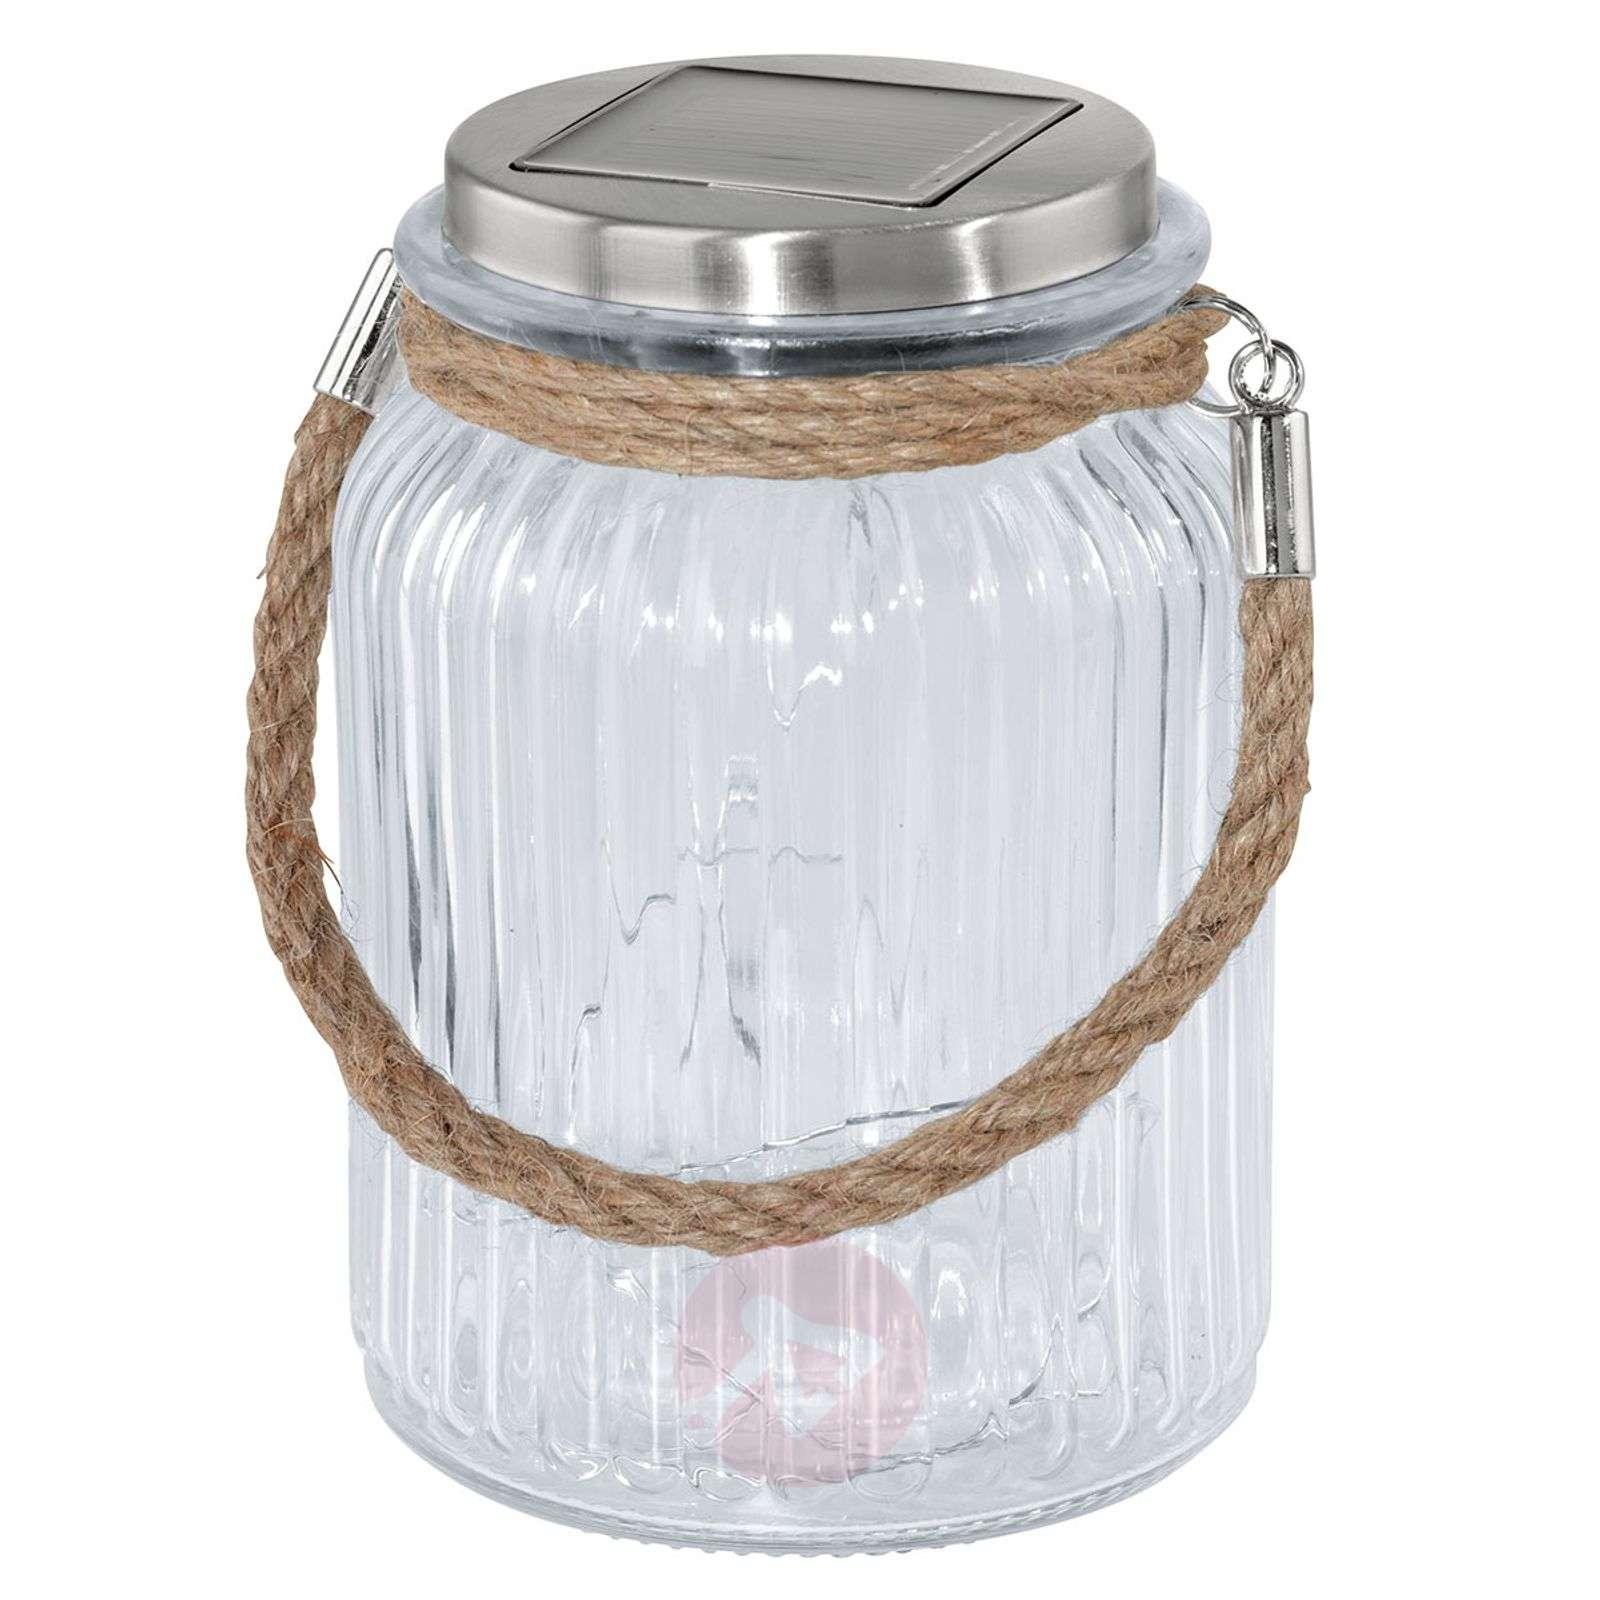 Decorative LED solar light Lea, jar shape-3000596-01